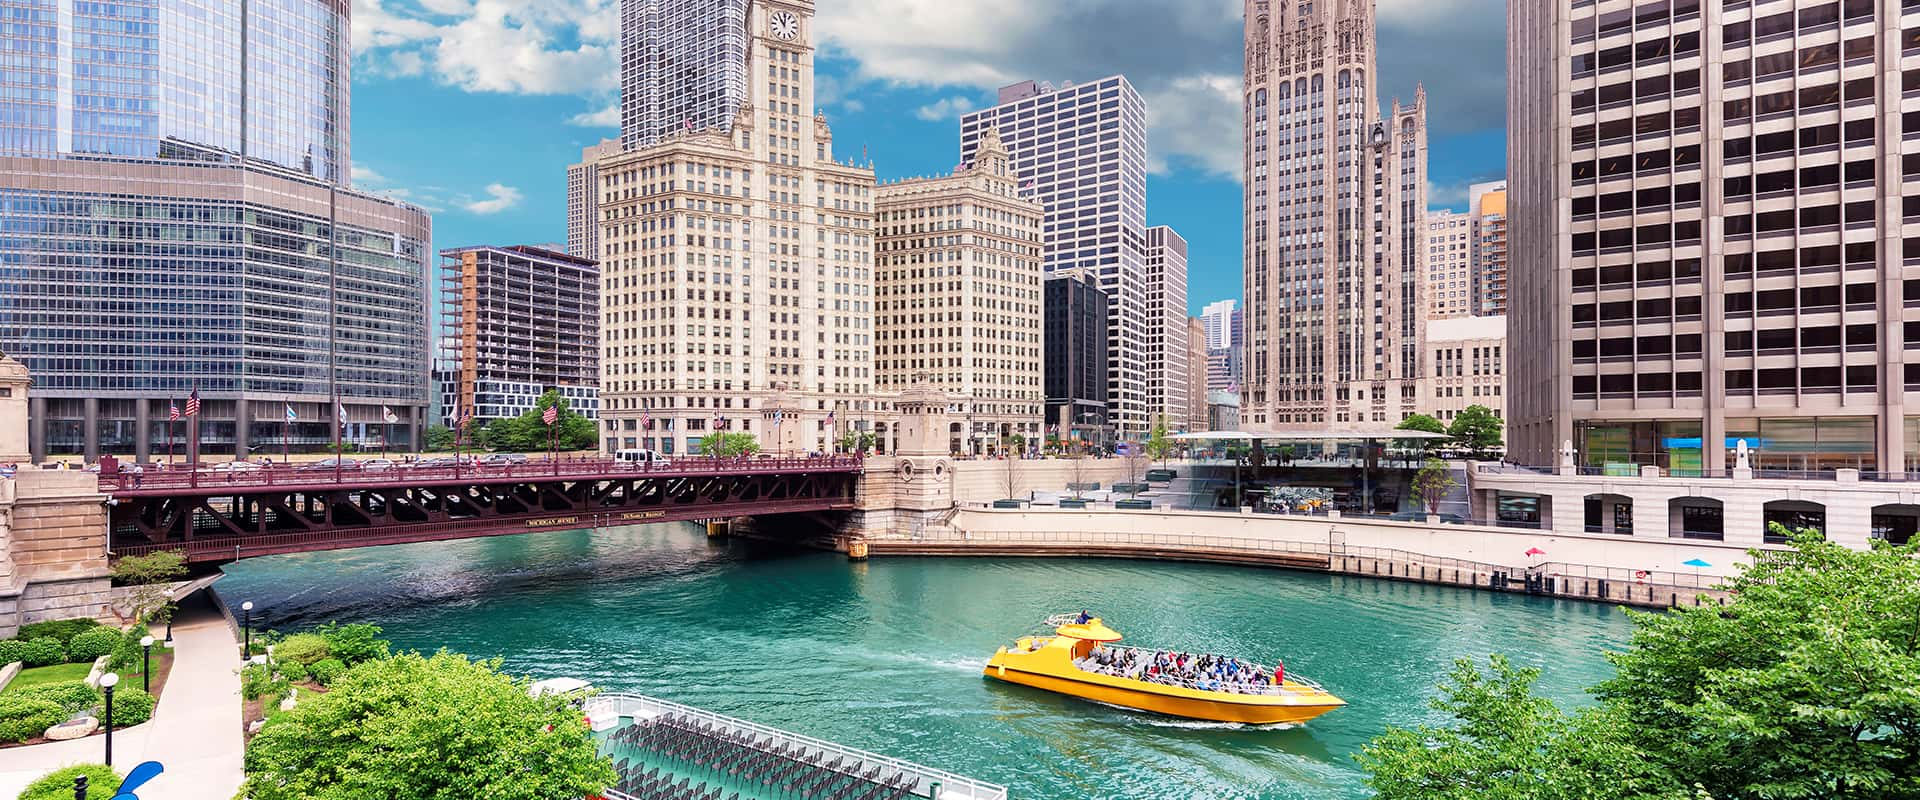 LPN Program in Chicago